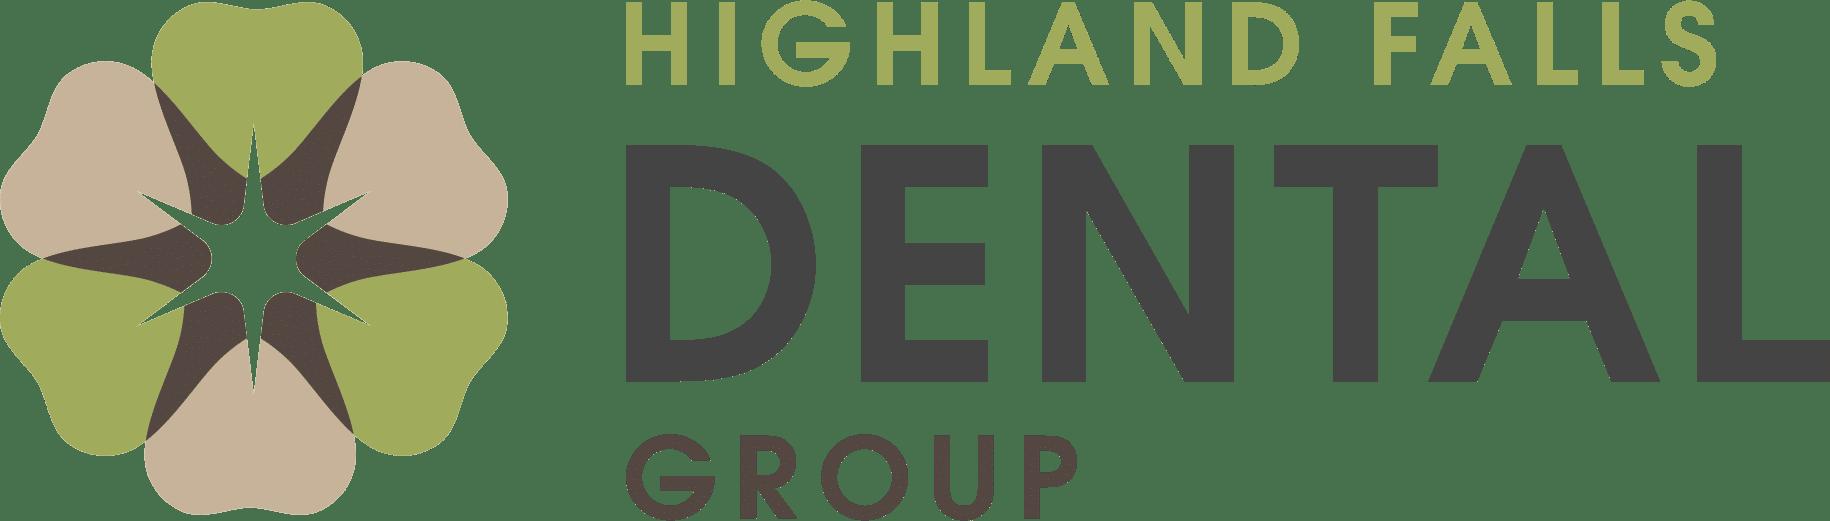 Highland Falls Dental Group